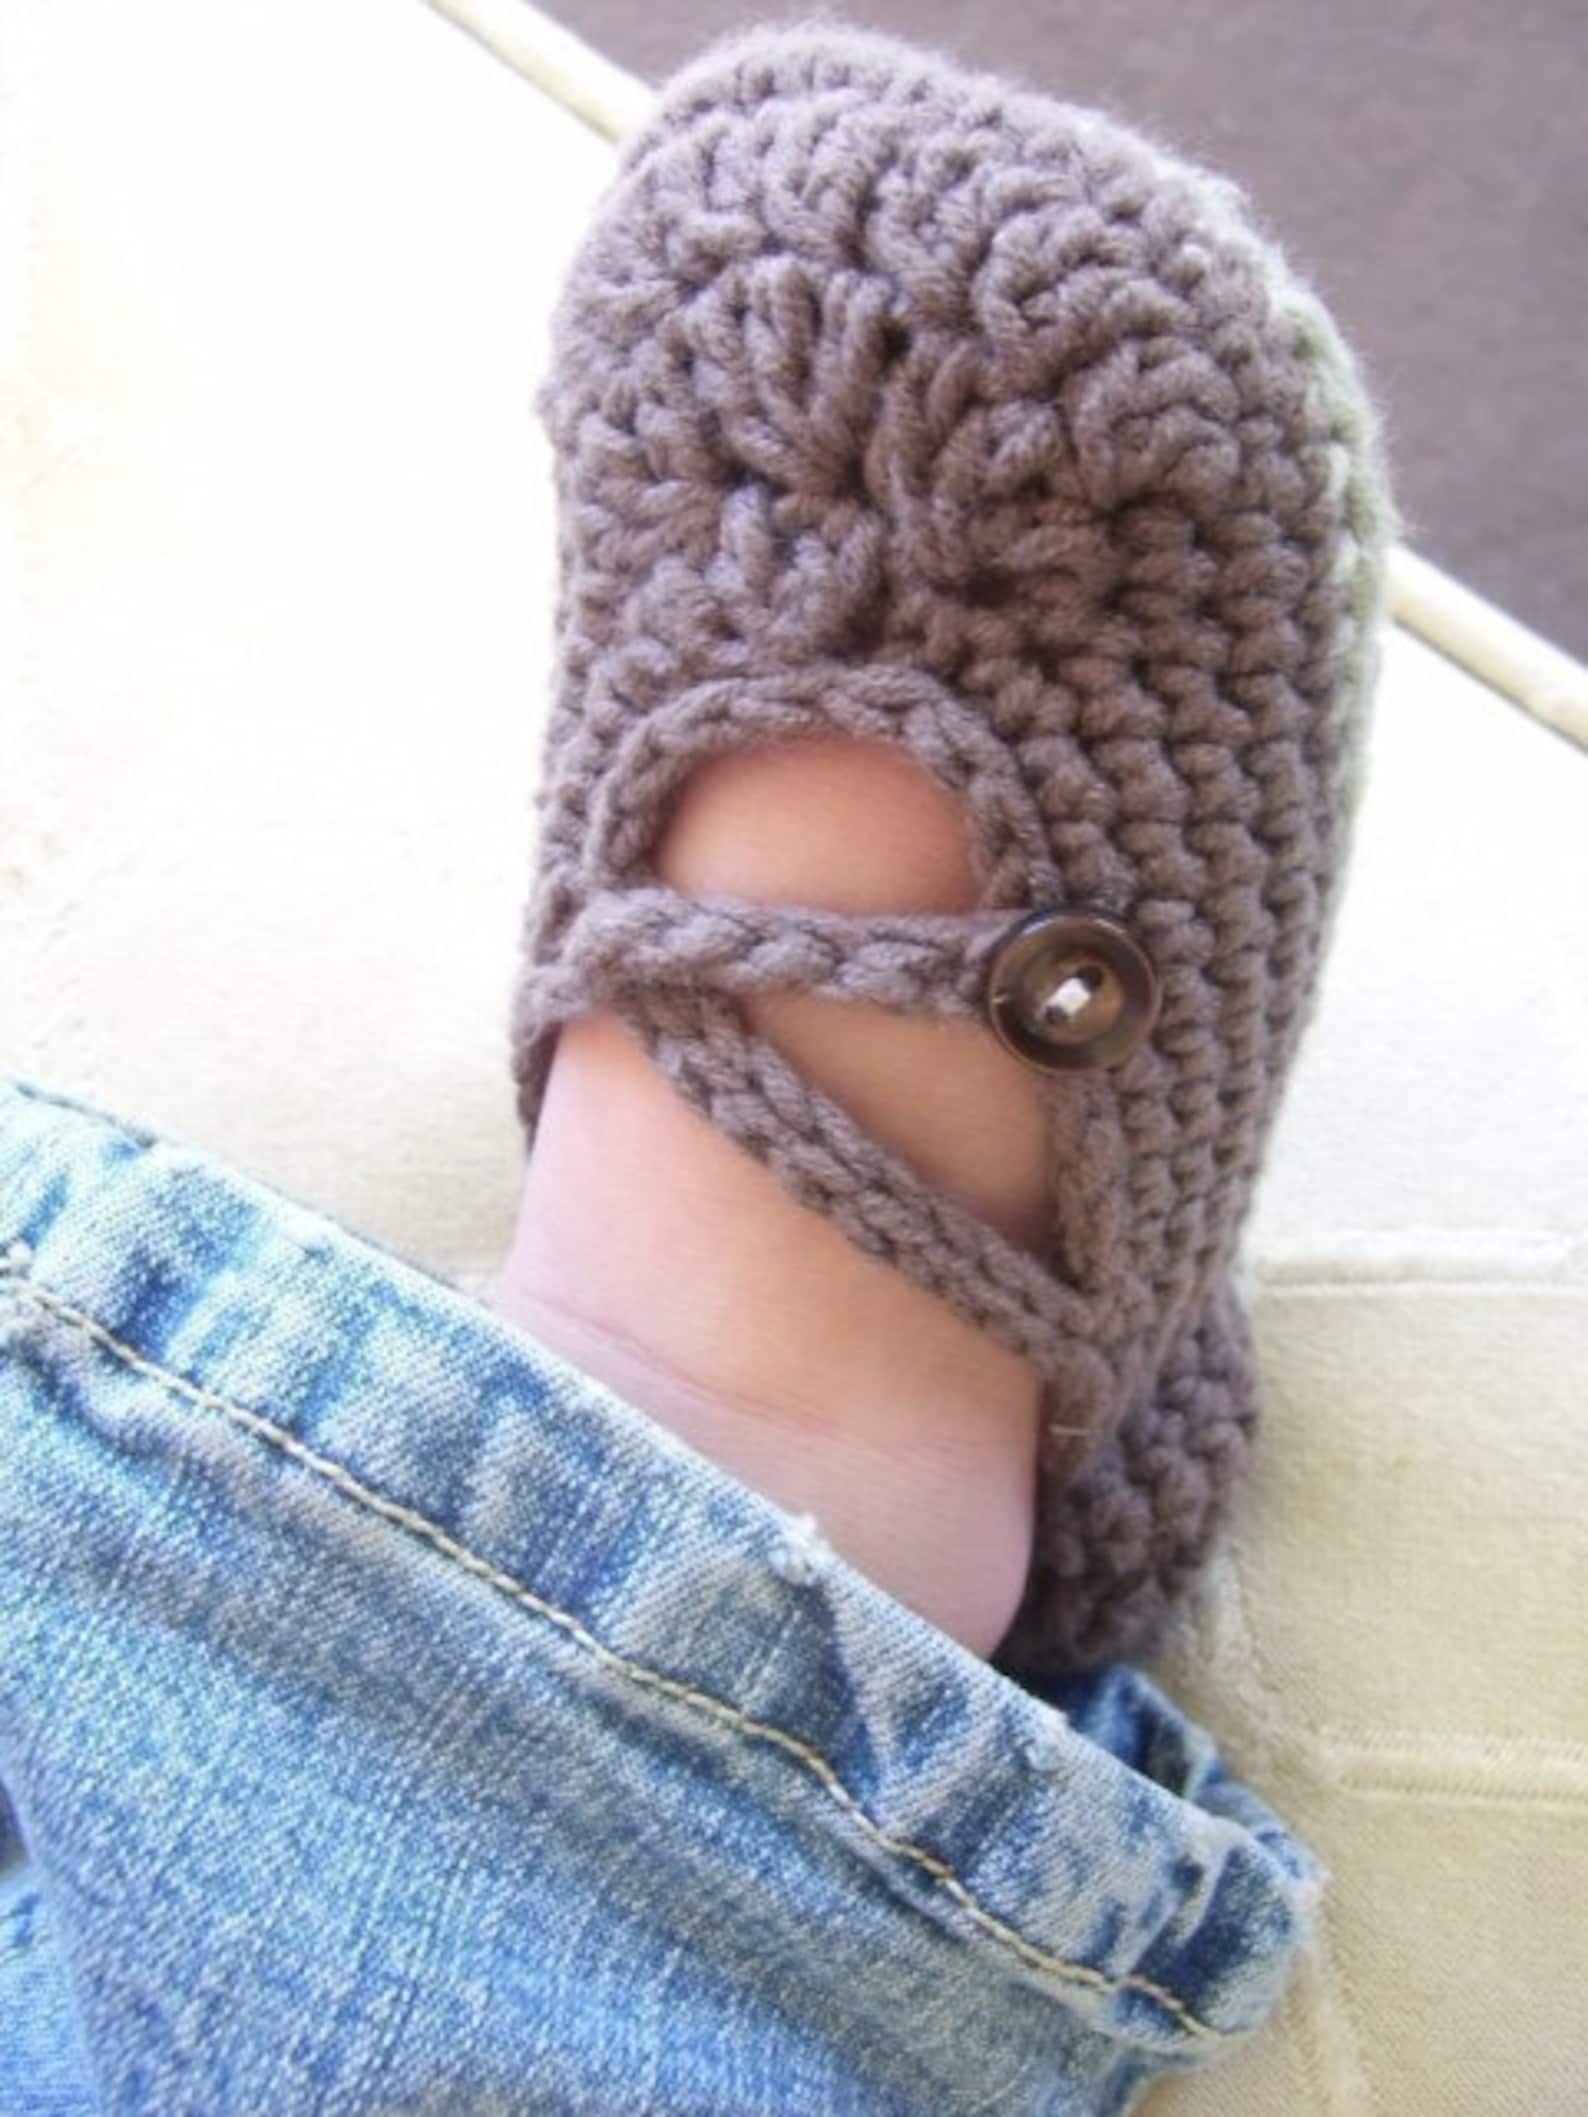 download now - crochet pattern cross-strap ballet flats - baby/toddler - pattern pdf